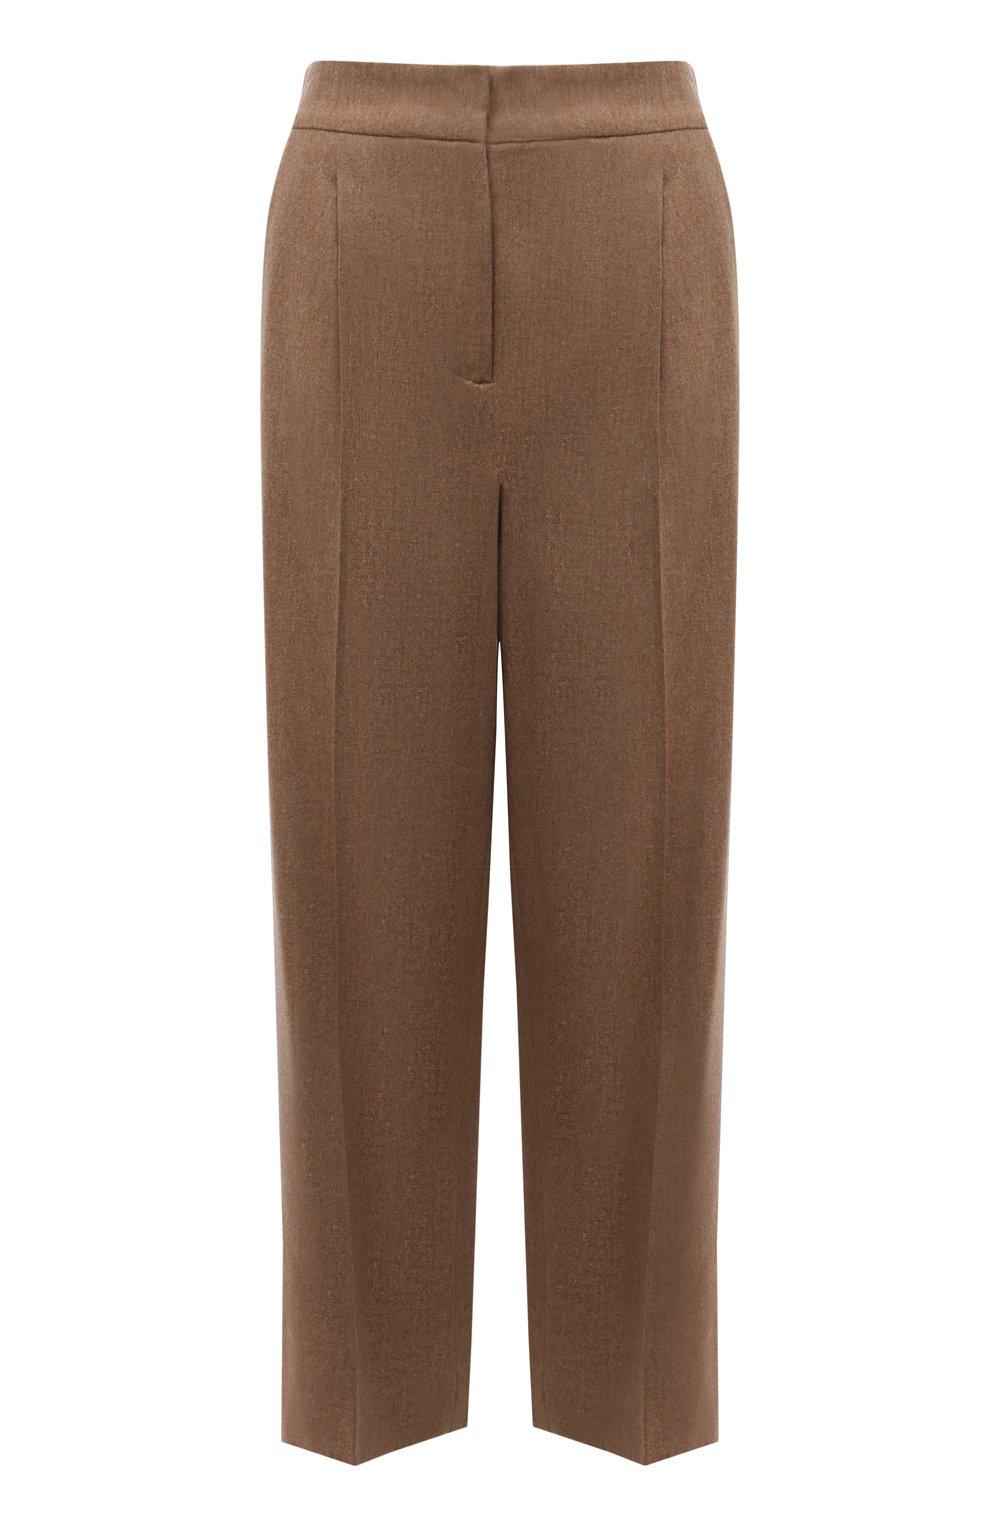 Женские шерстяные брюки LORENA ANTONIAZZI бежевого цвета, арт. A2139PA29A/3273 | Фото 1